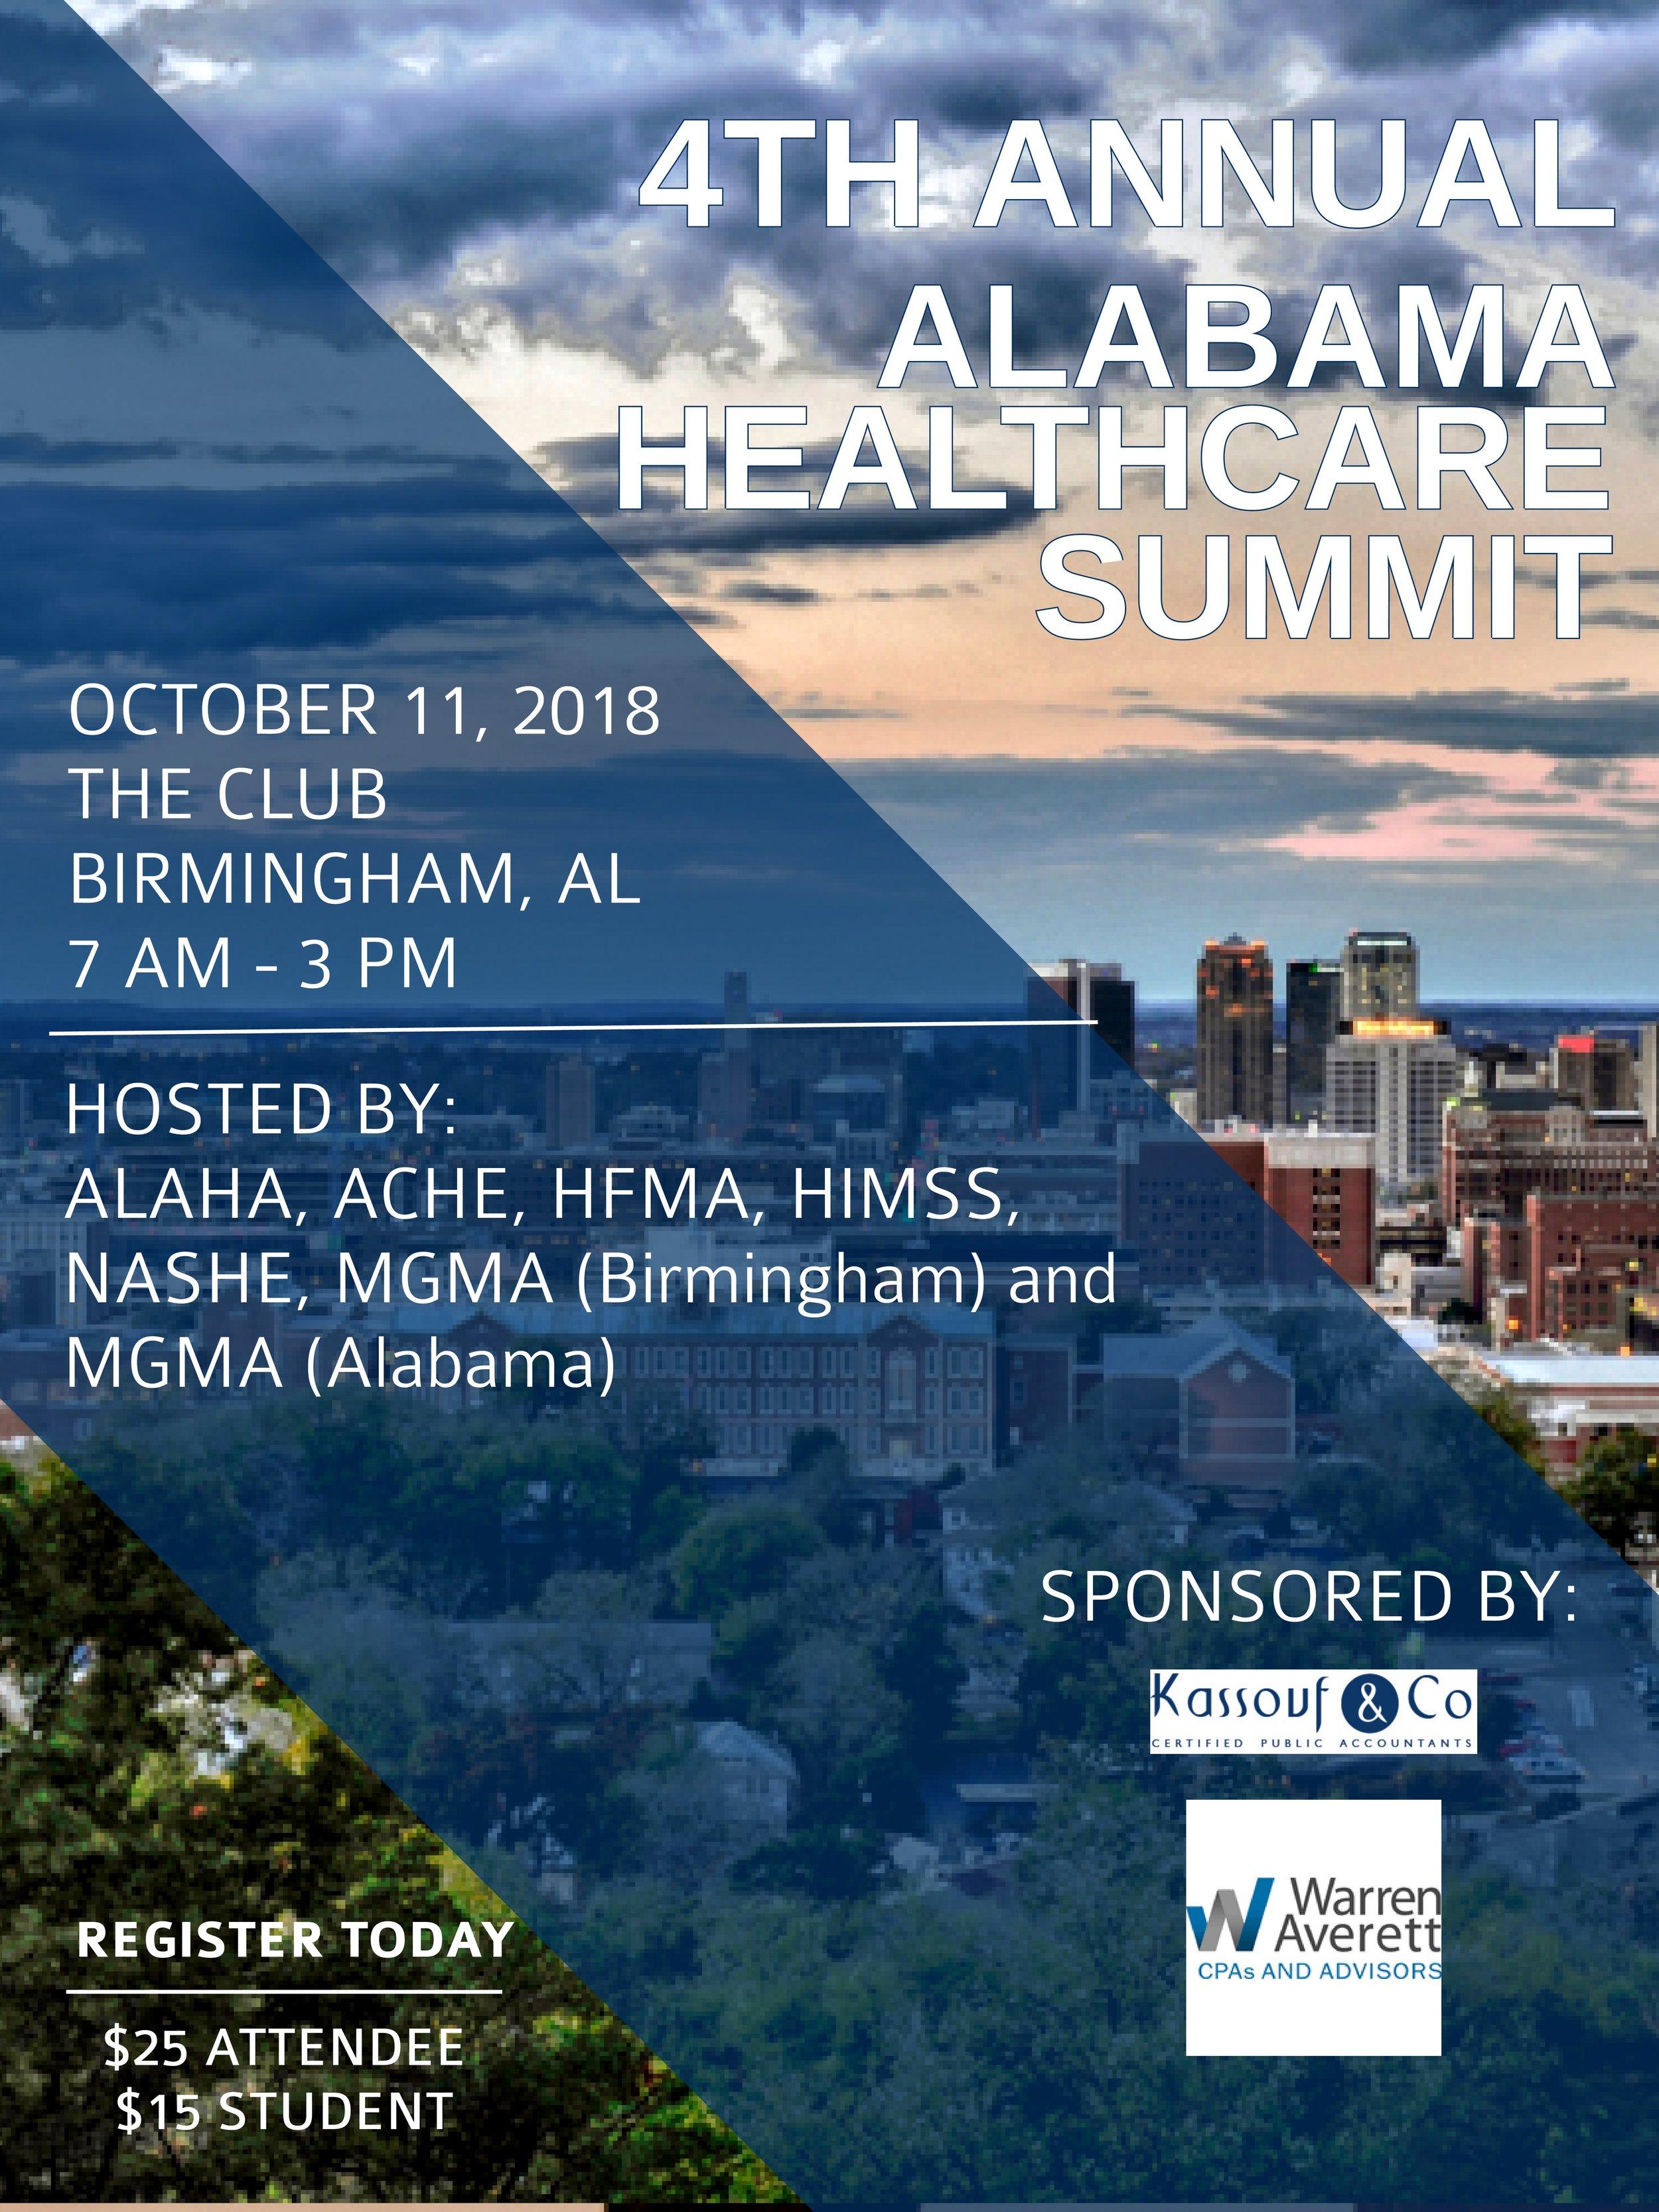 4th Annual Alabama Healthcare Summit Flyer.jpeg